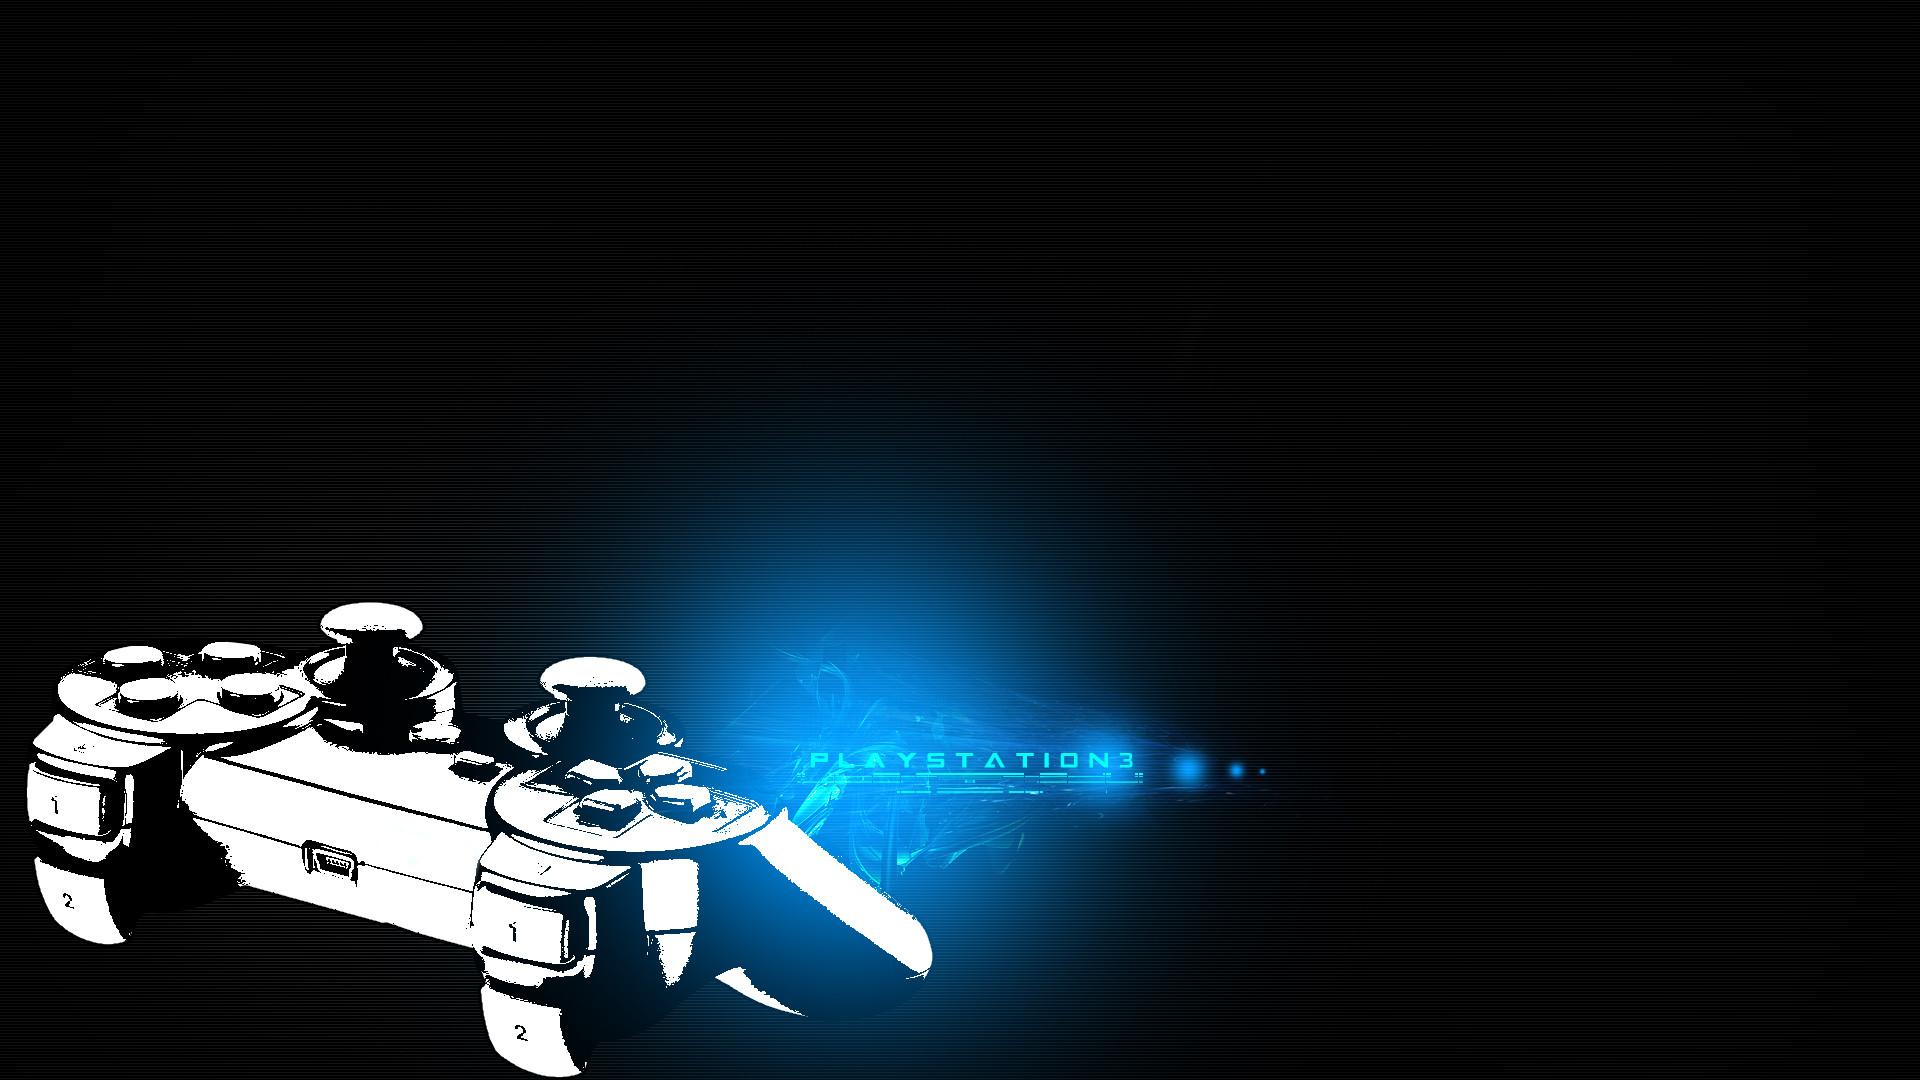 PlayStation 3 Wallpaper · Hd BackgroundsPlaystationAndroid